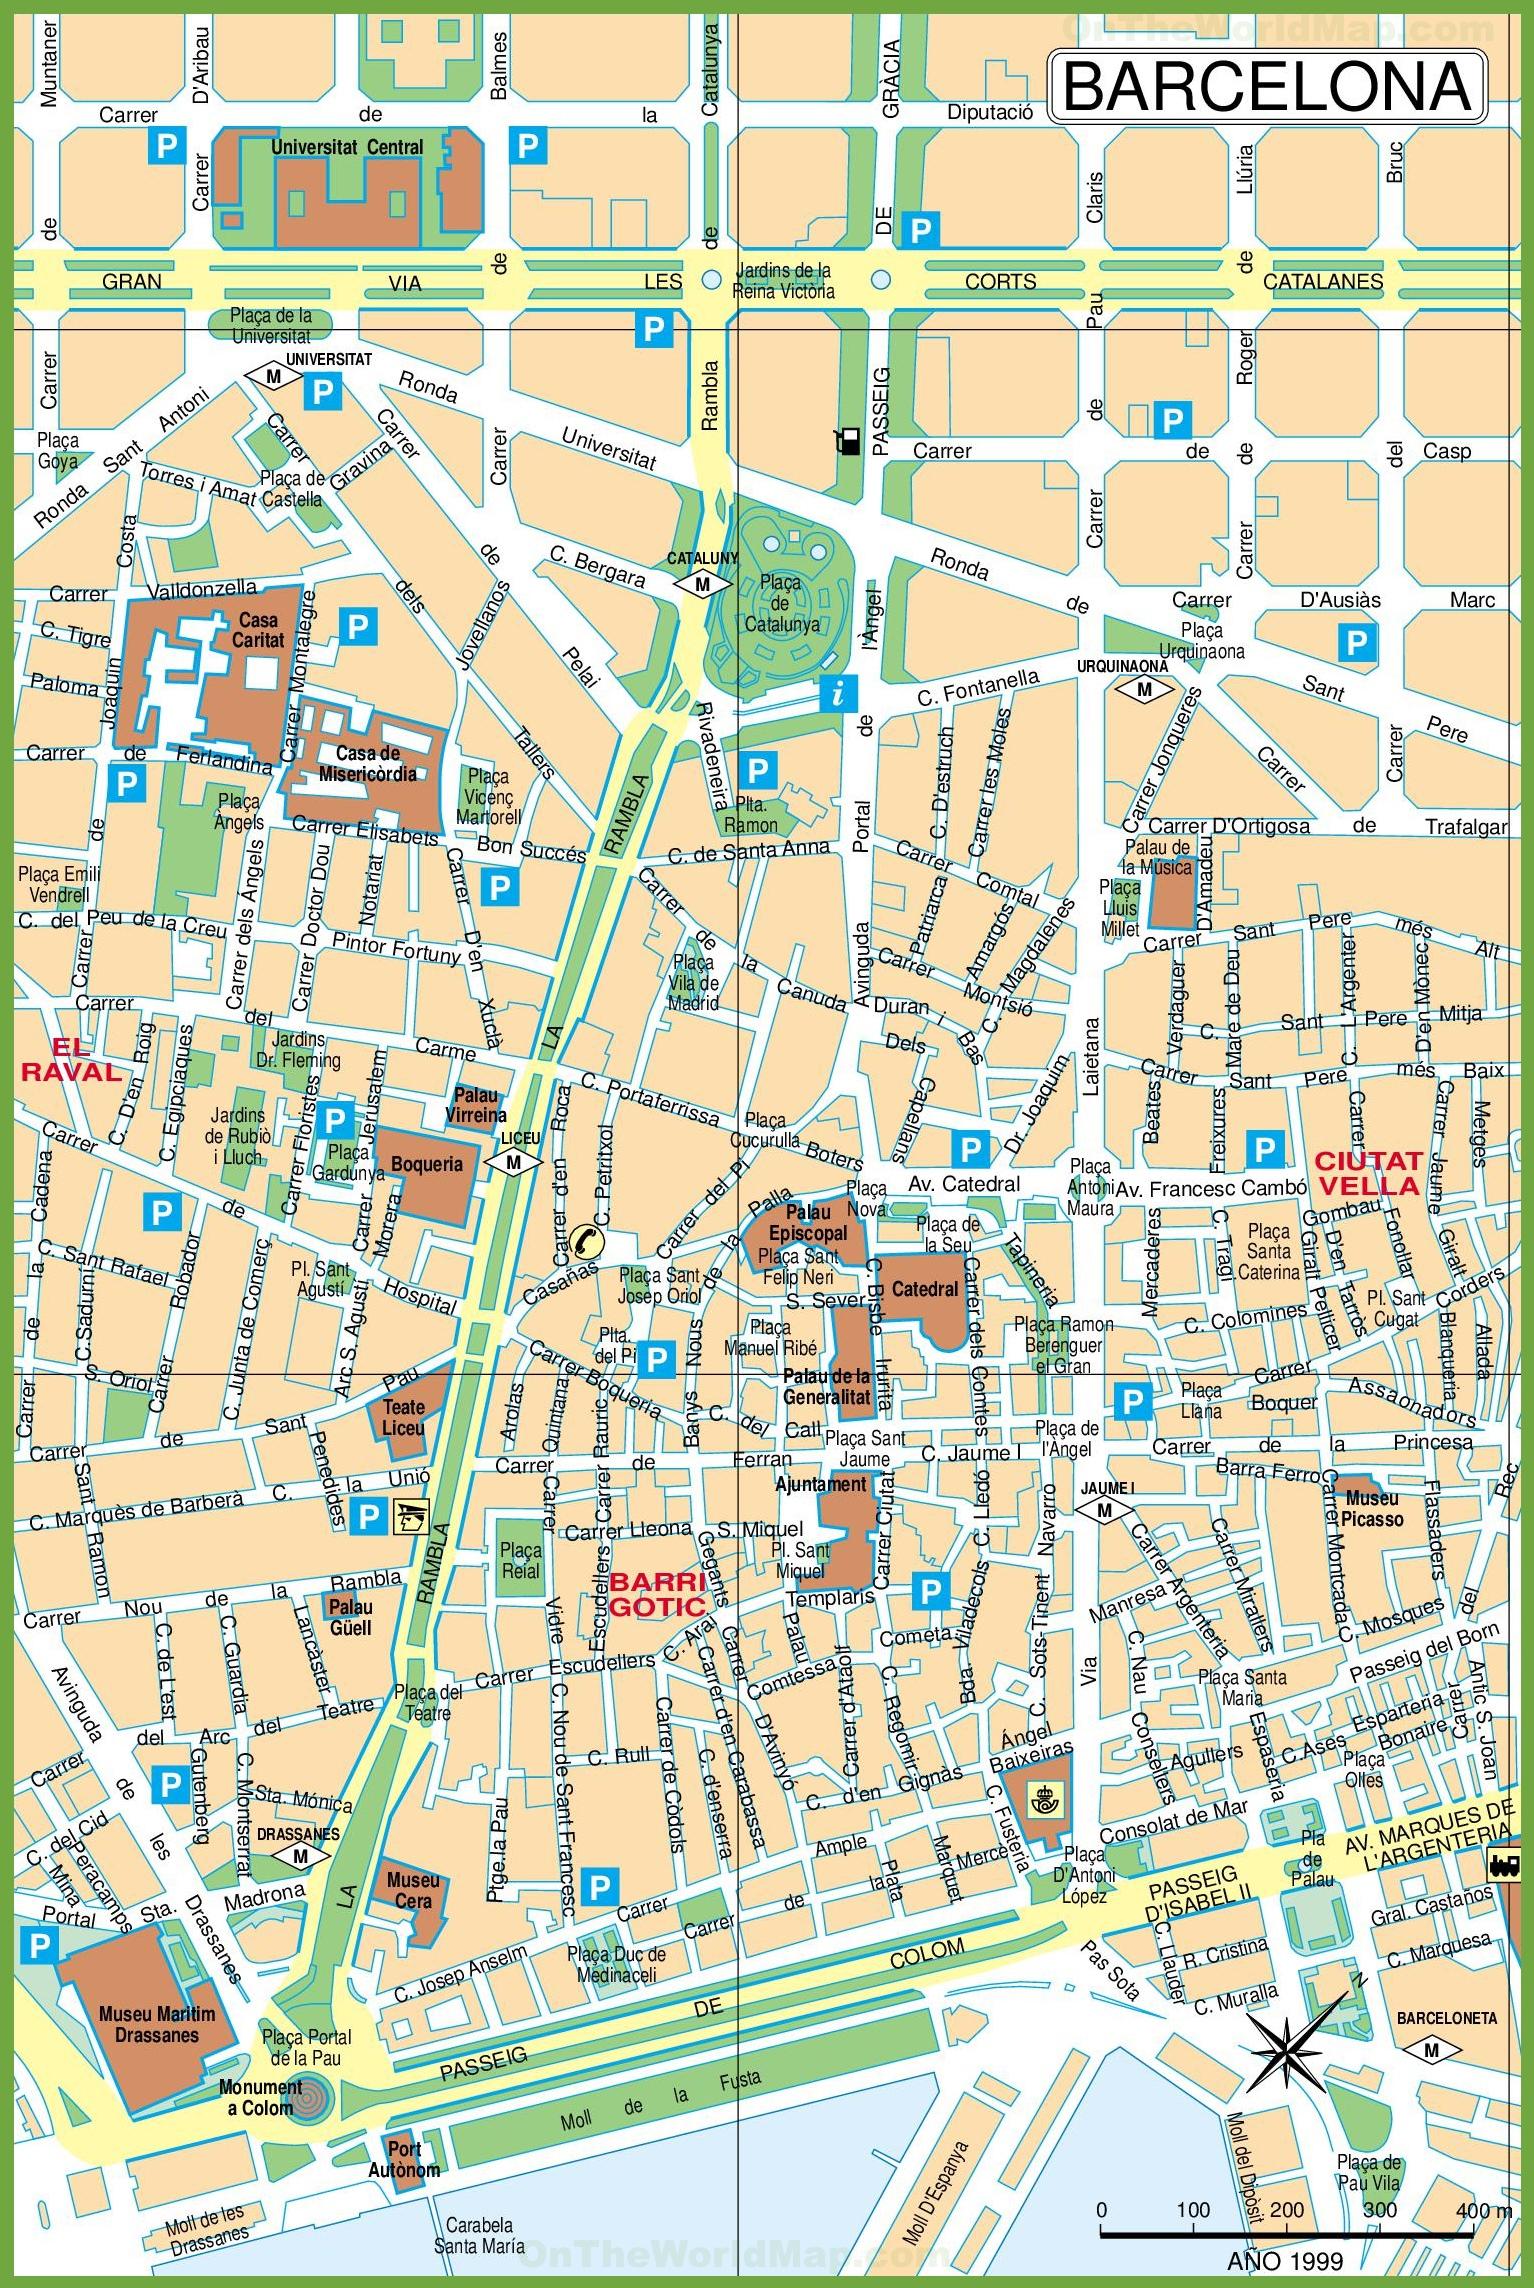 Barcelona City Center Map - Printable Map Of Barcelona